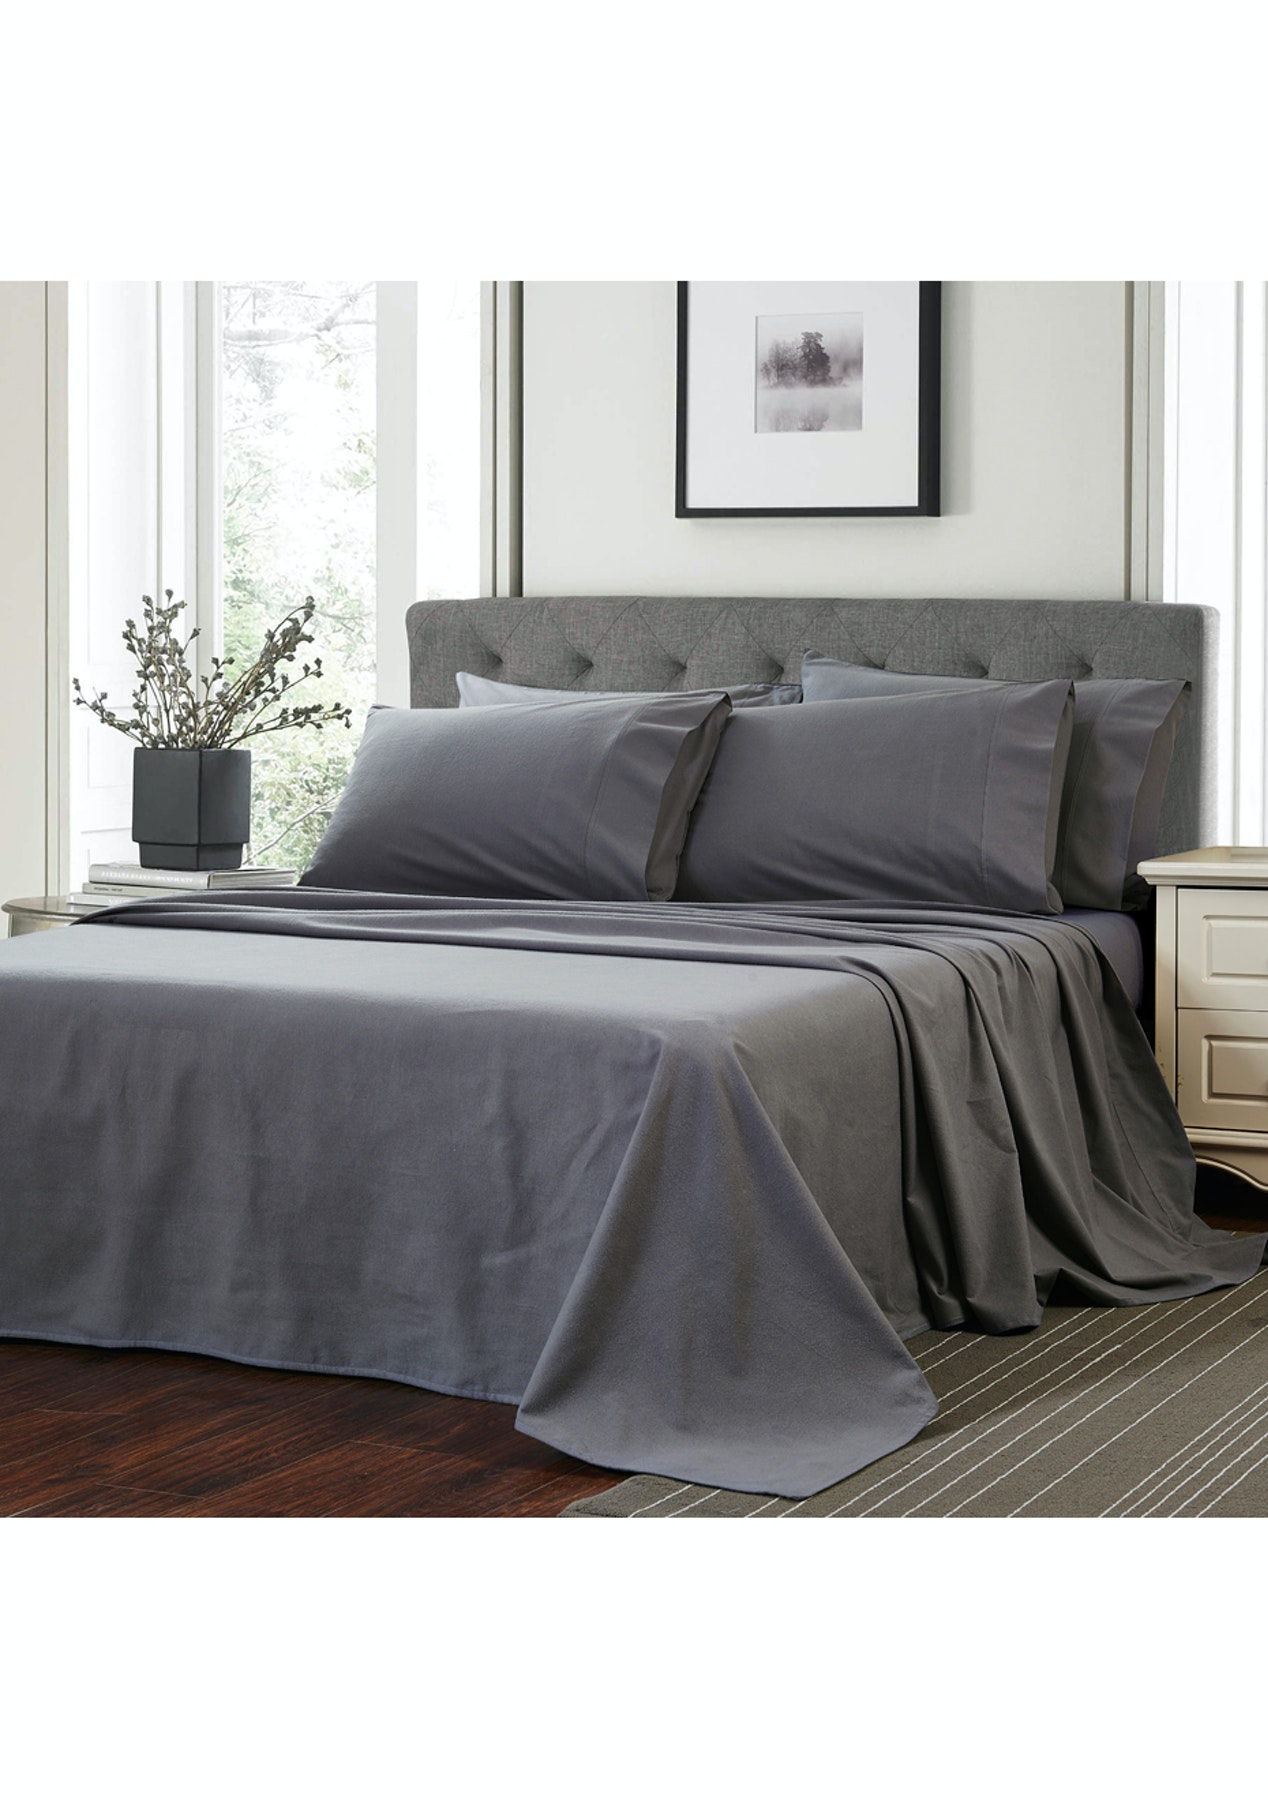 Linens More Flannelette Queen Sheet Set Charcoal Linens